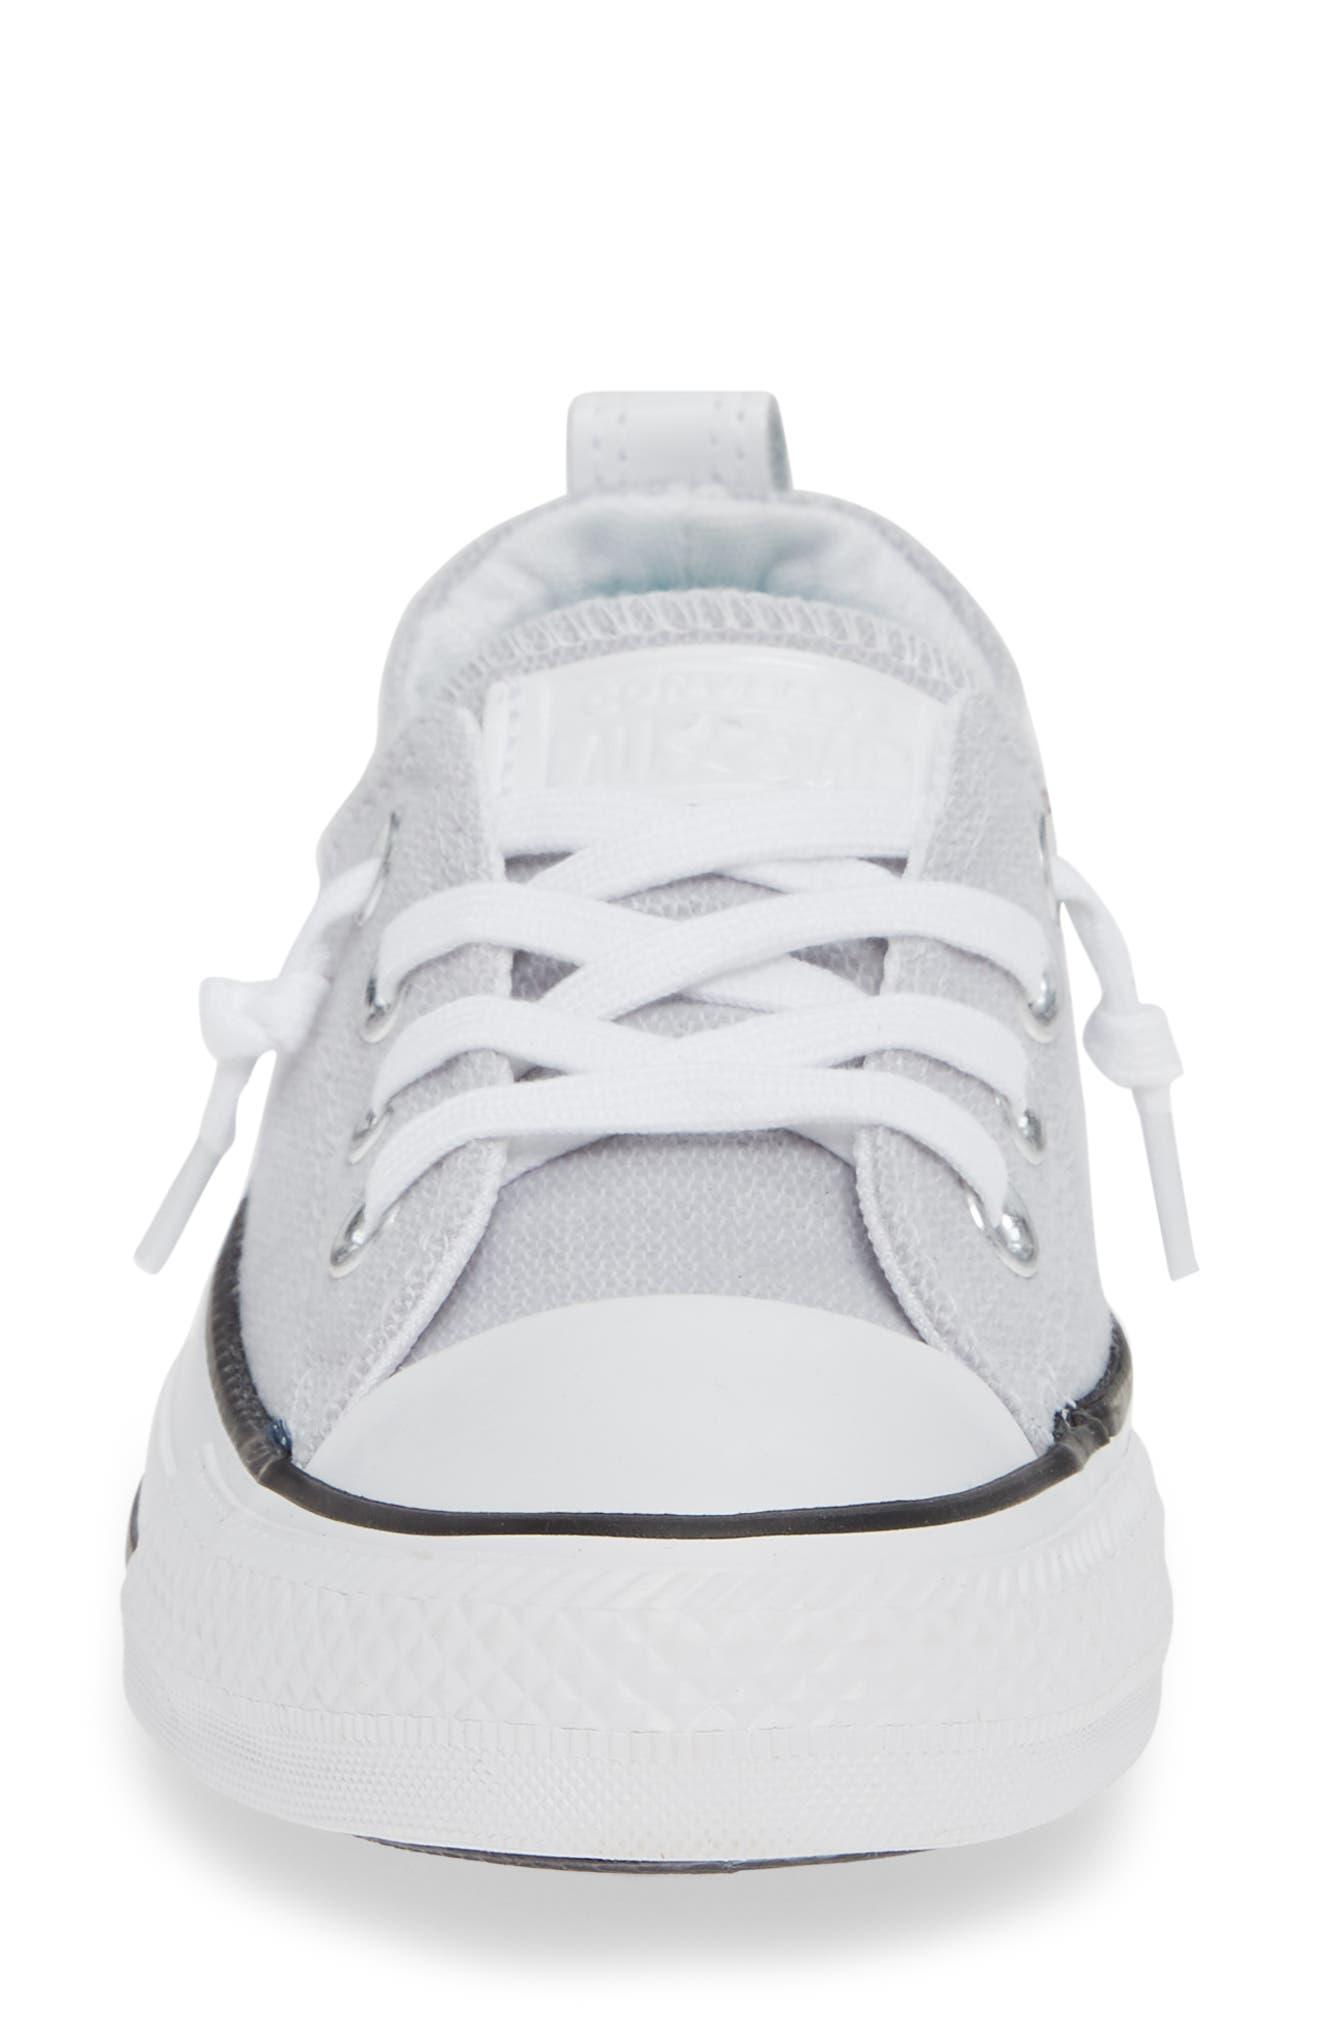 CONVERSE, Chuck Taylor<sup>®</sup> 'Shoreline' Sneaker, Alternate thumbnail 4, color, WHITE